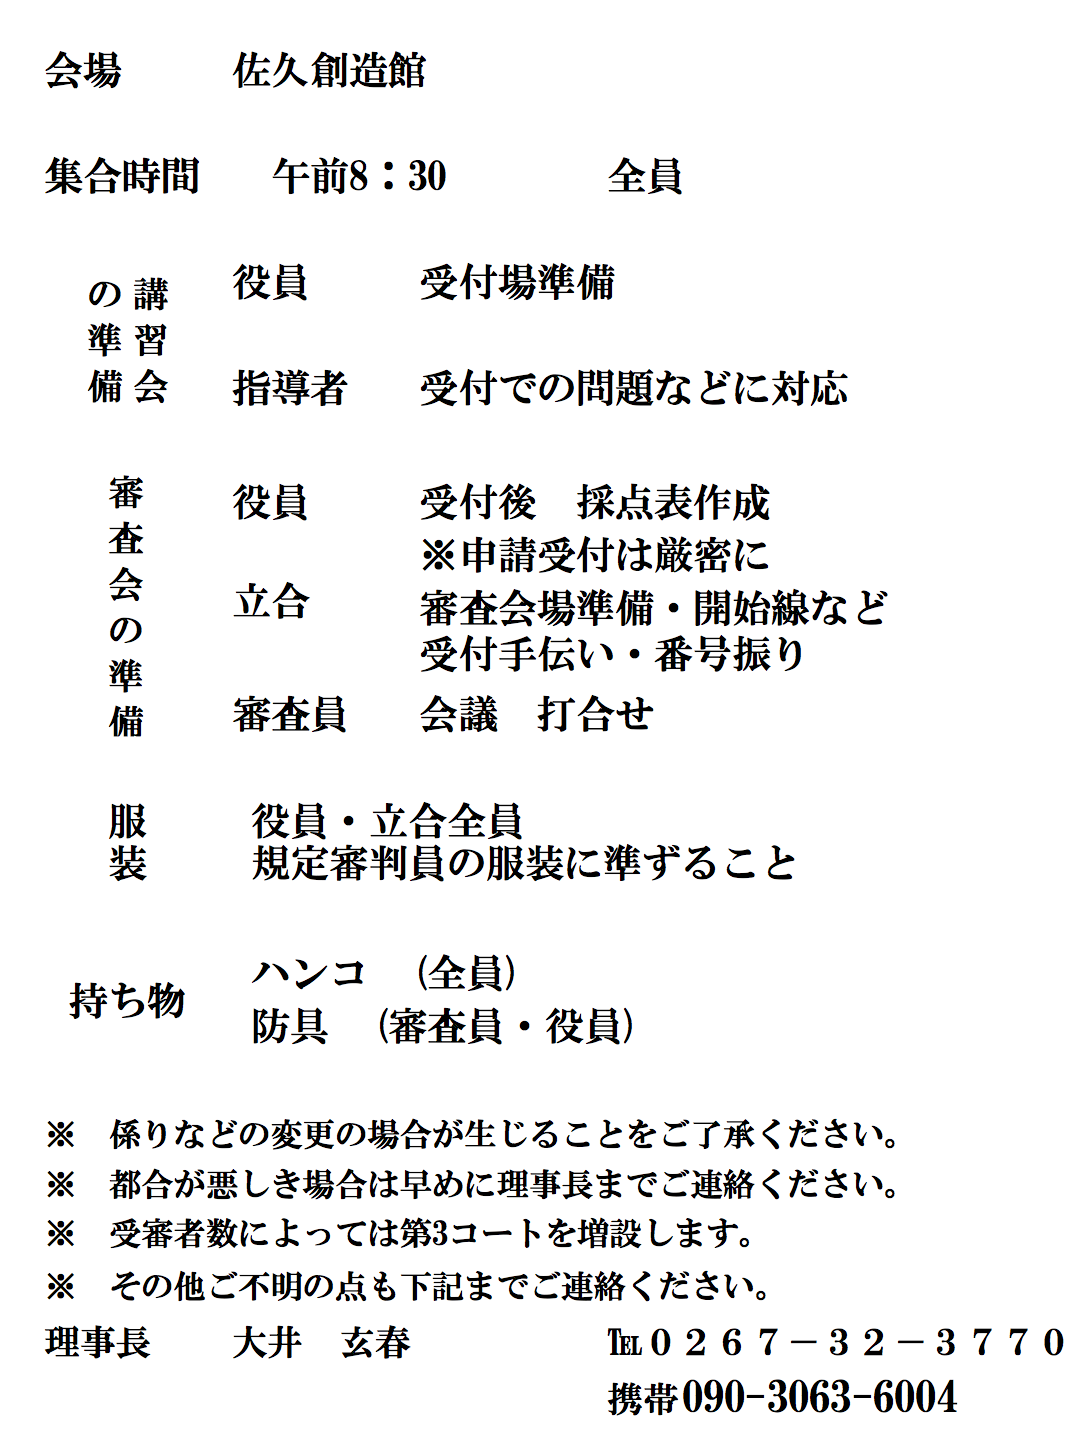 h26_kyu_yakuin_02